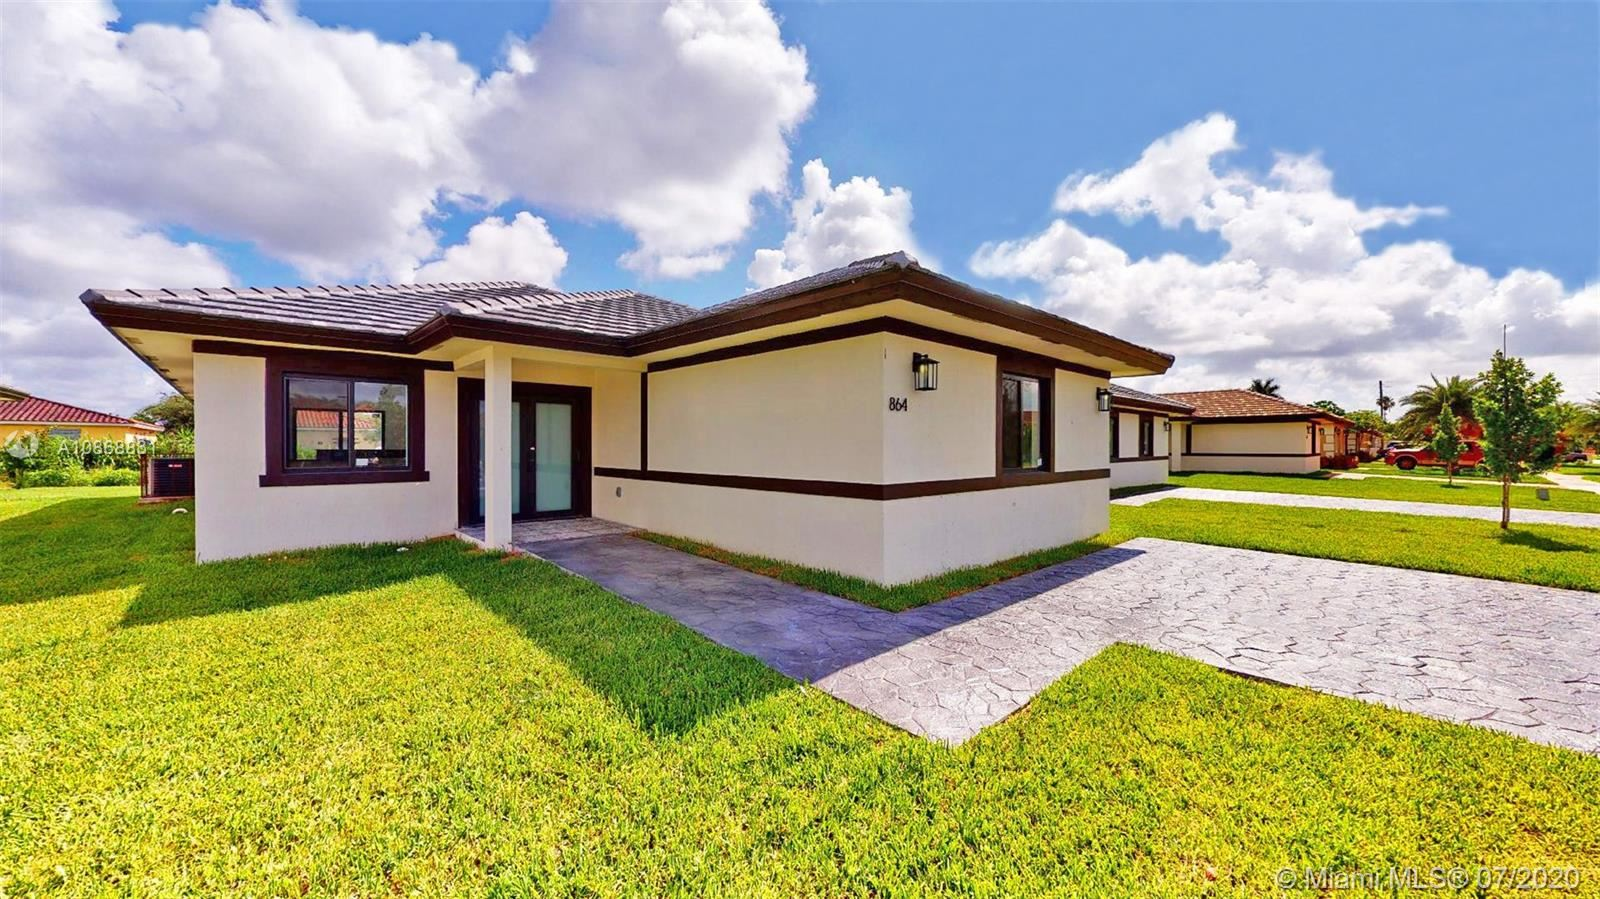 864 SW 5 ST, Florida City, FL 33034 - #: A10868831